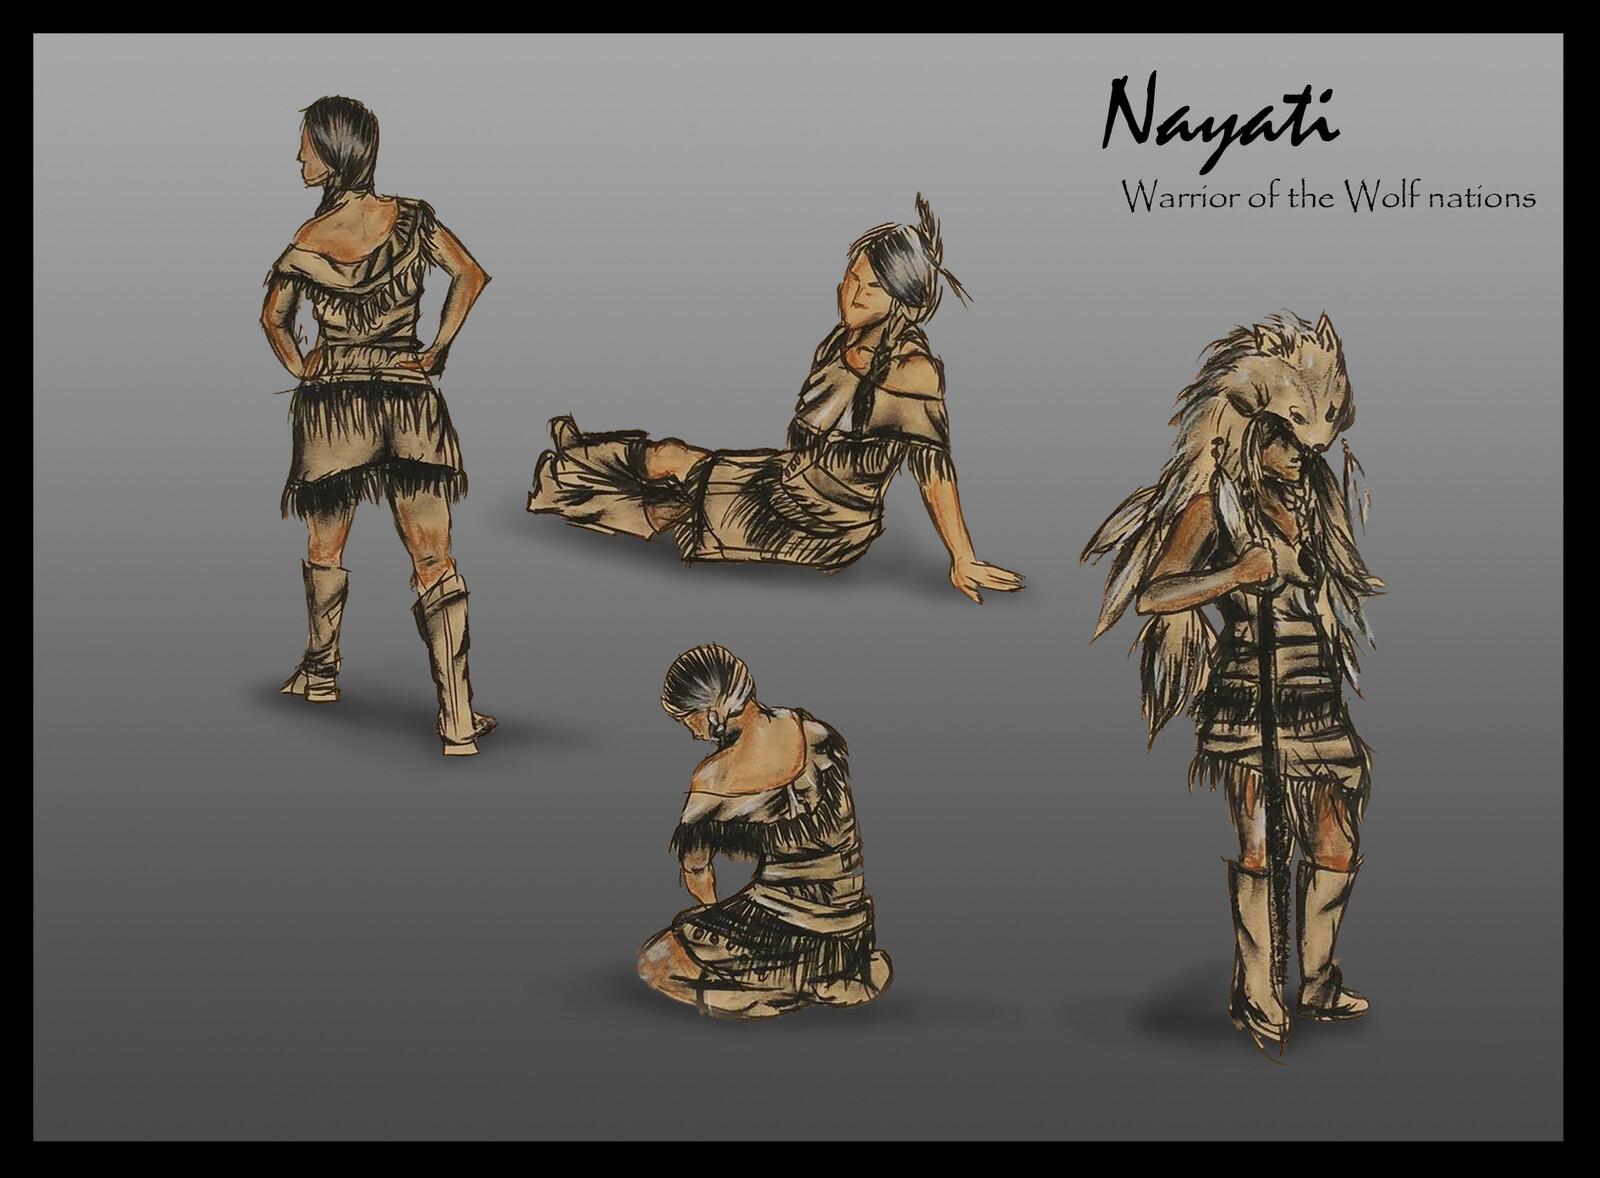 Nayati - Warrior of the Wolf nations